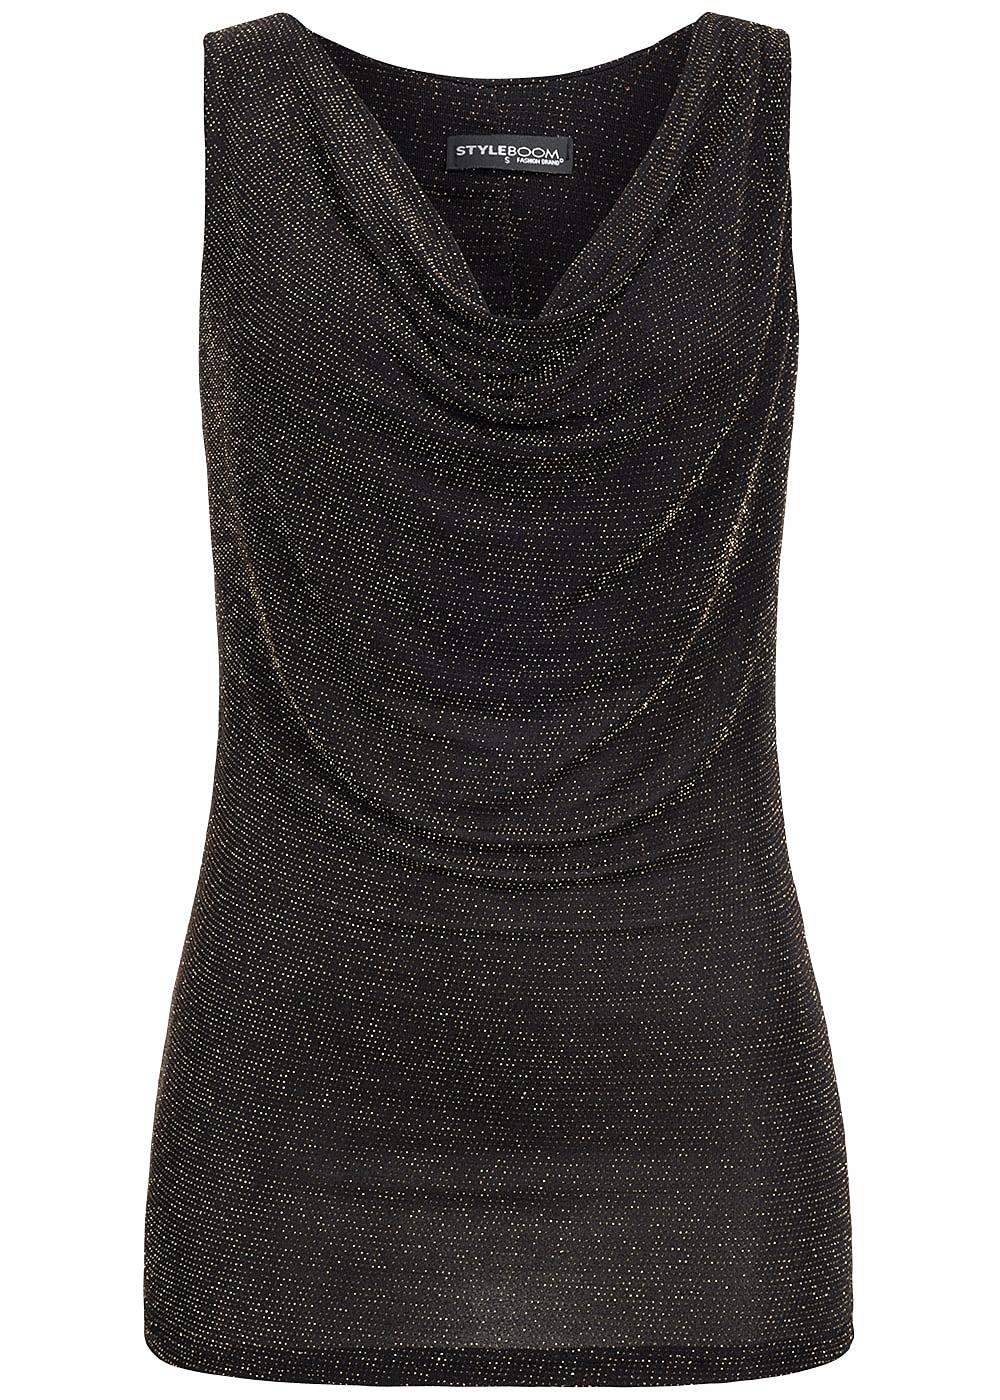 styleboom fashion damen tank top wasserfall ausschnitt. Black Bedroom Furniture Sets. Home Design Ideas